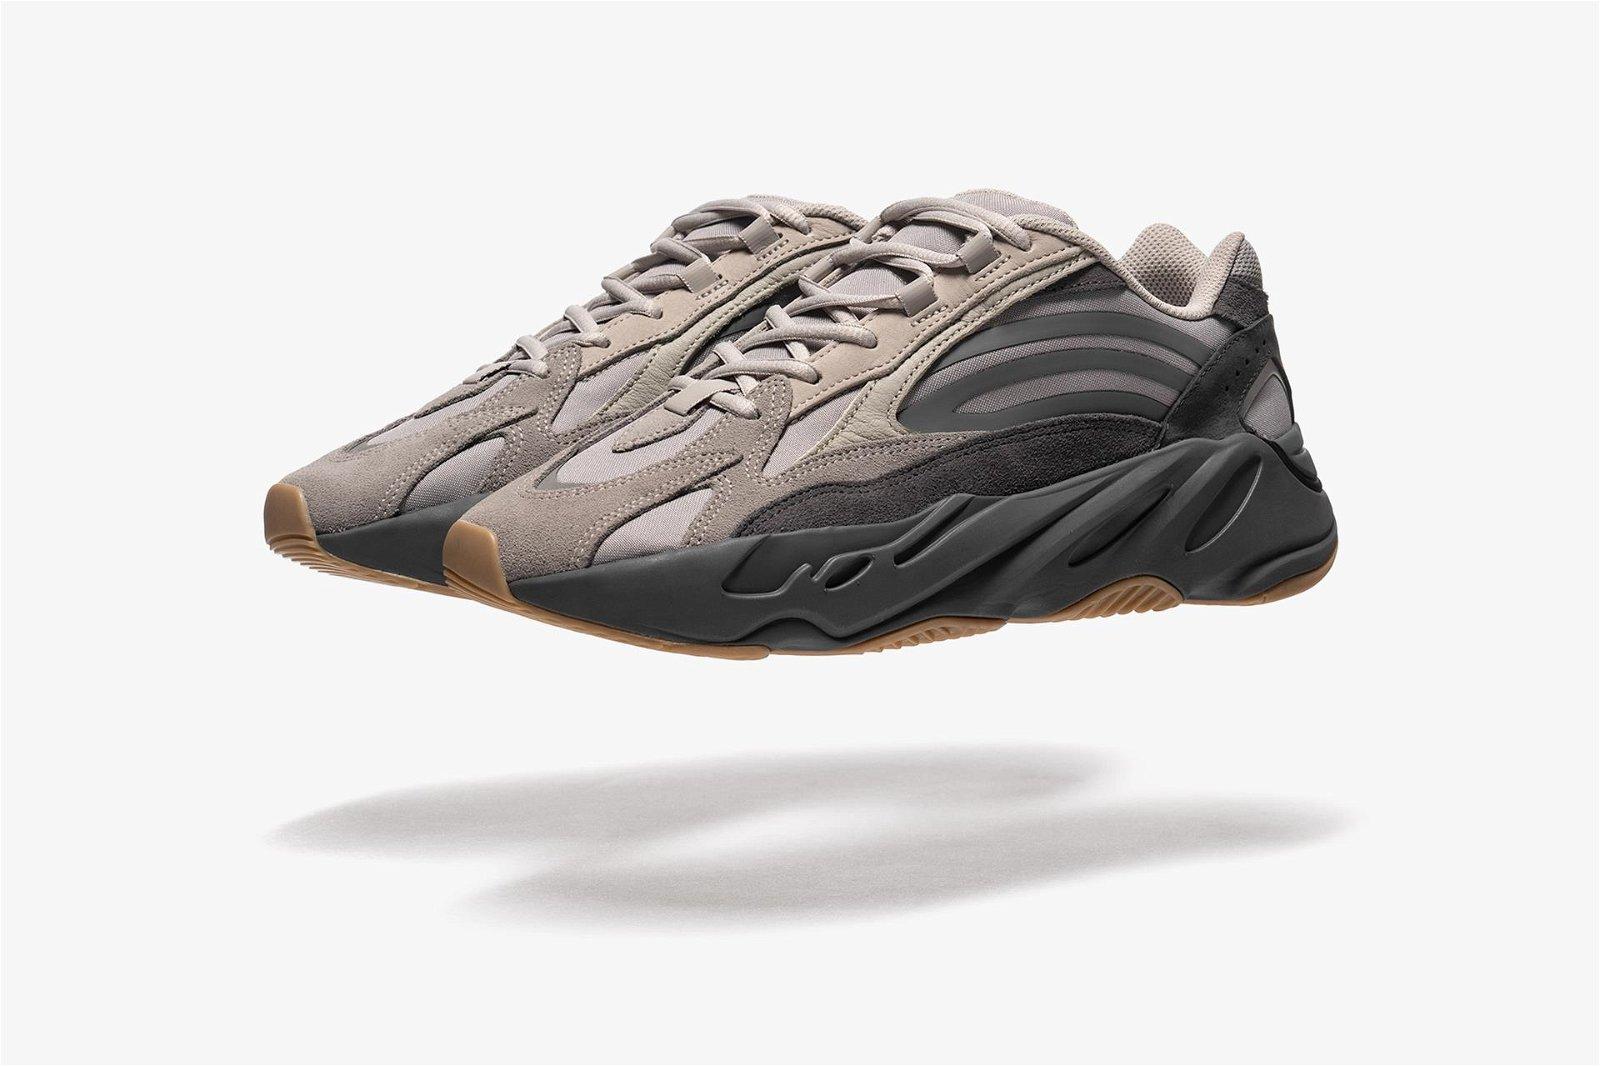 WTAPS \u0026 adidas Yeezy BOOST 700 V2